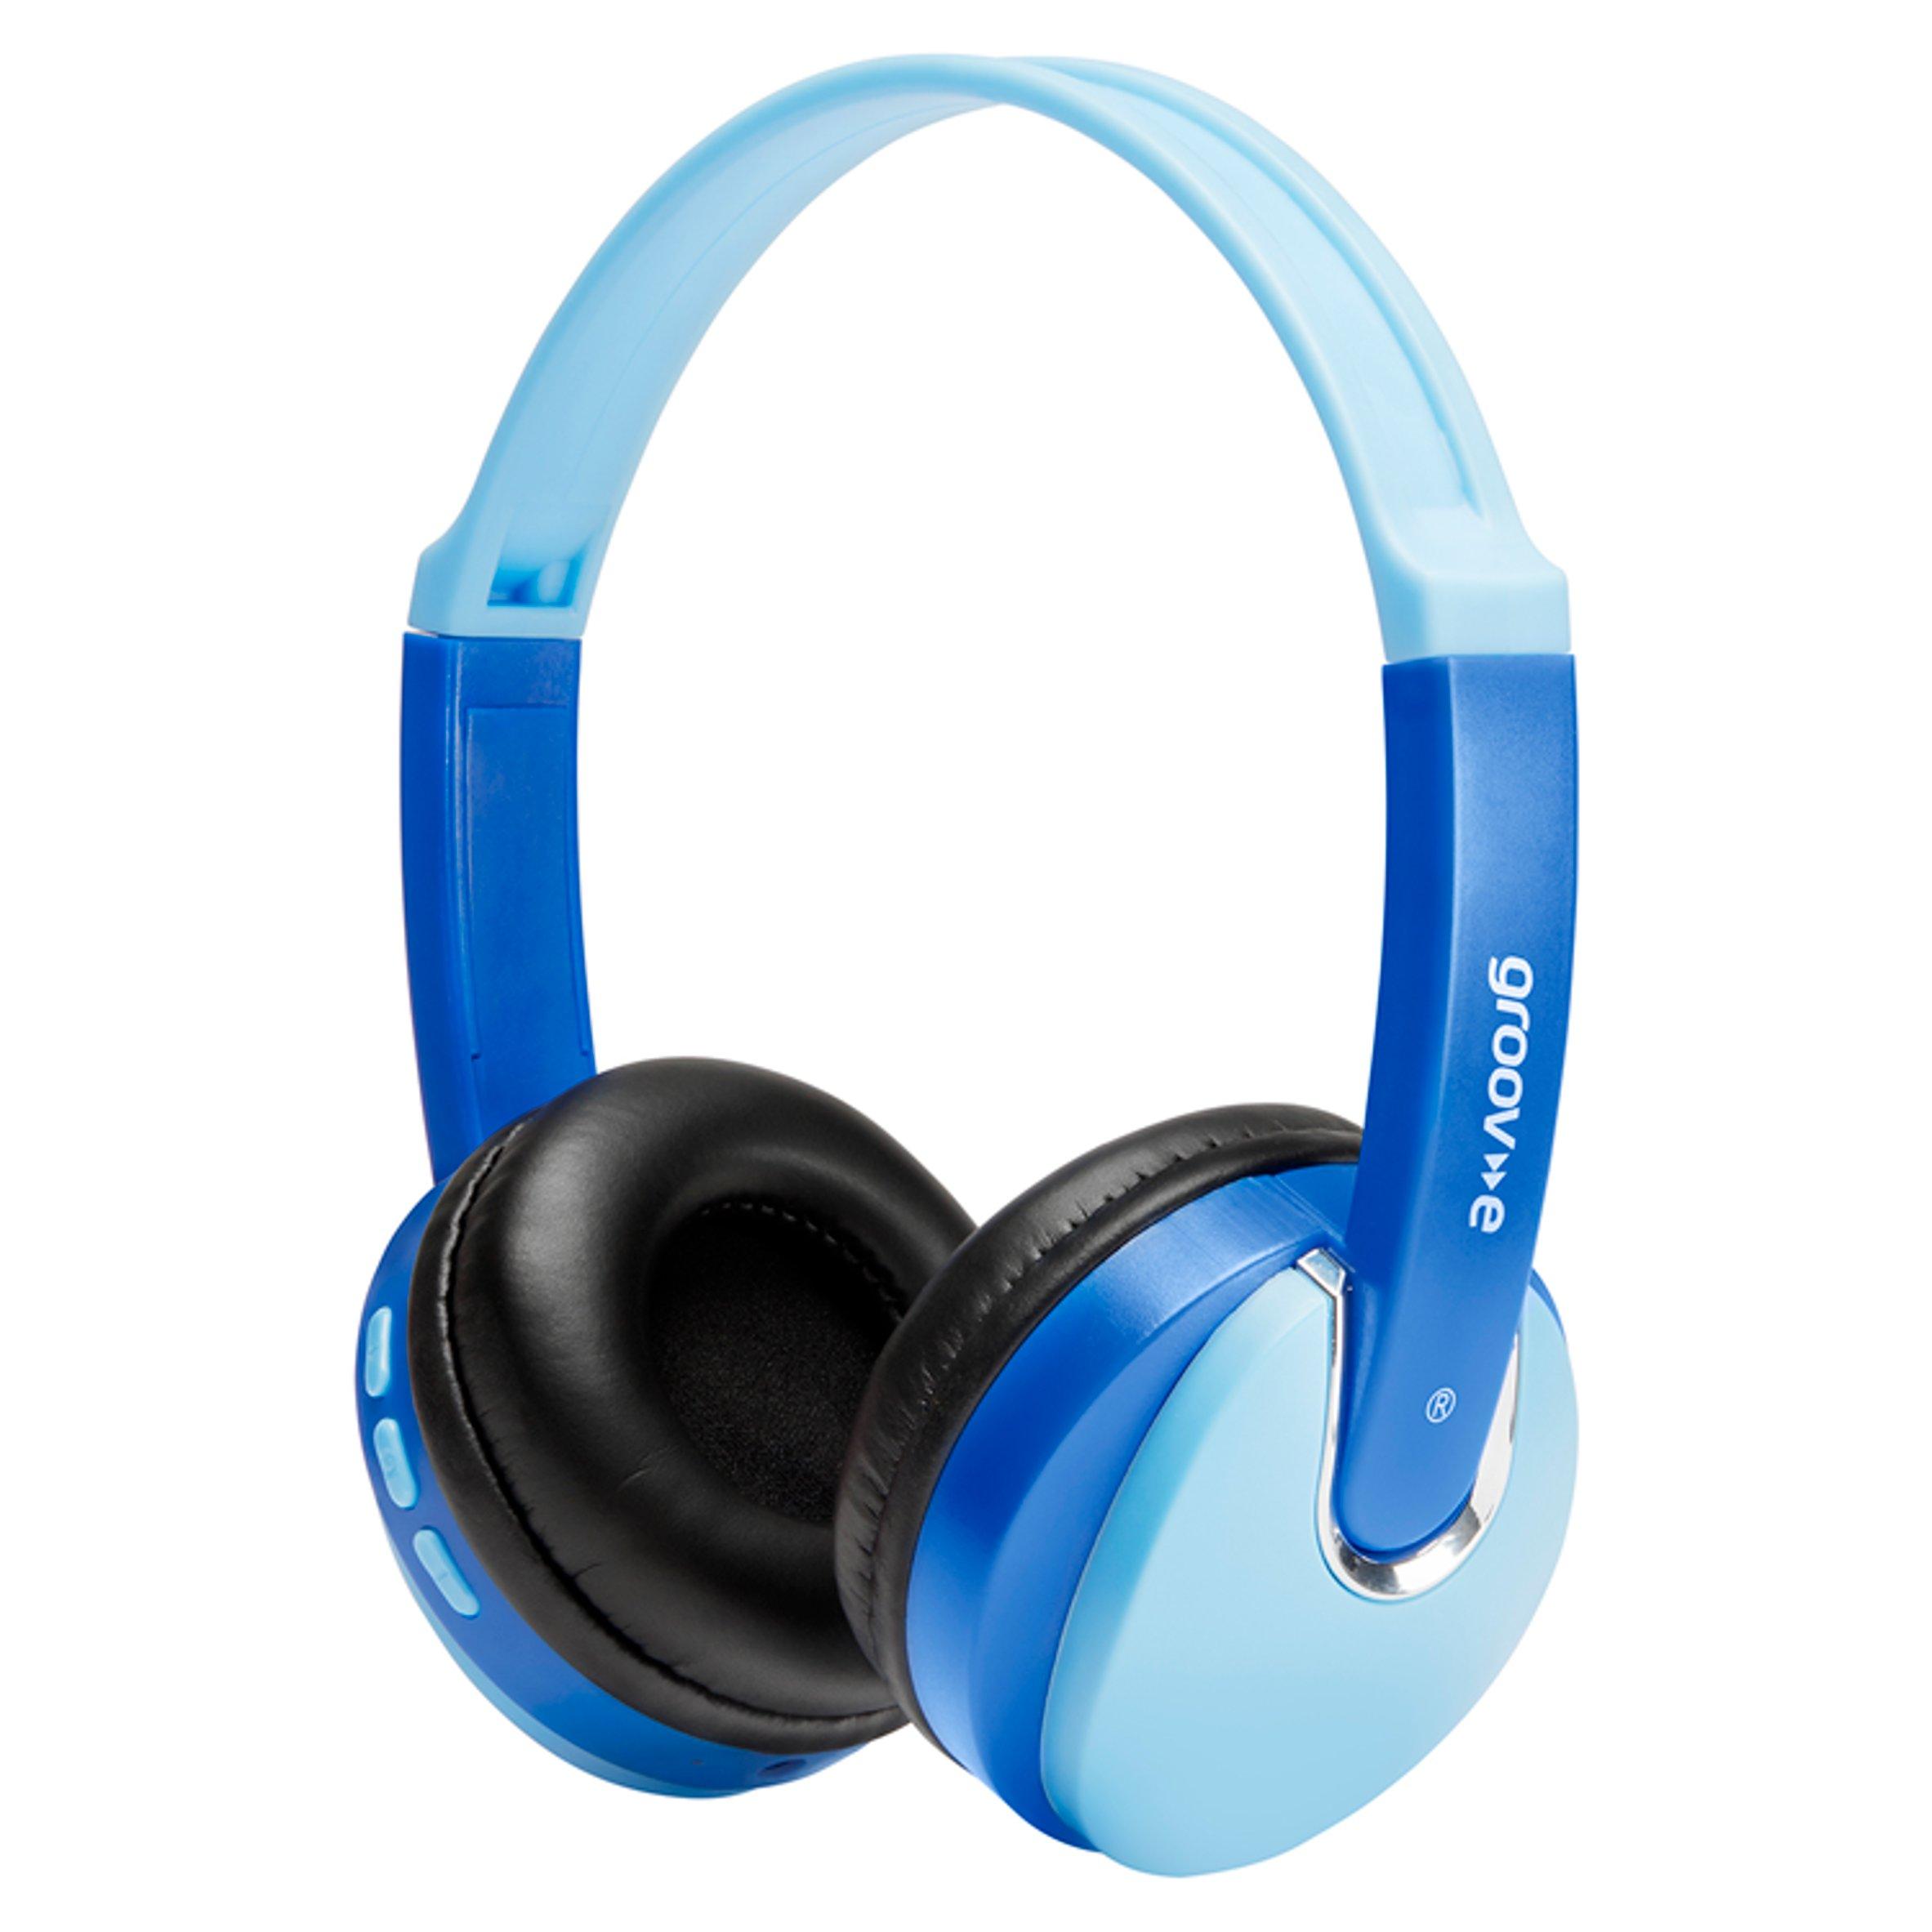 Groov-E Kidz Bluetooth Headphones Blue